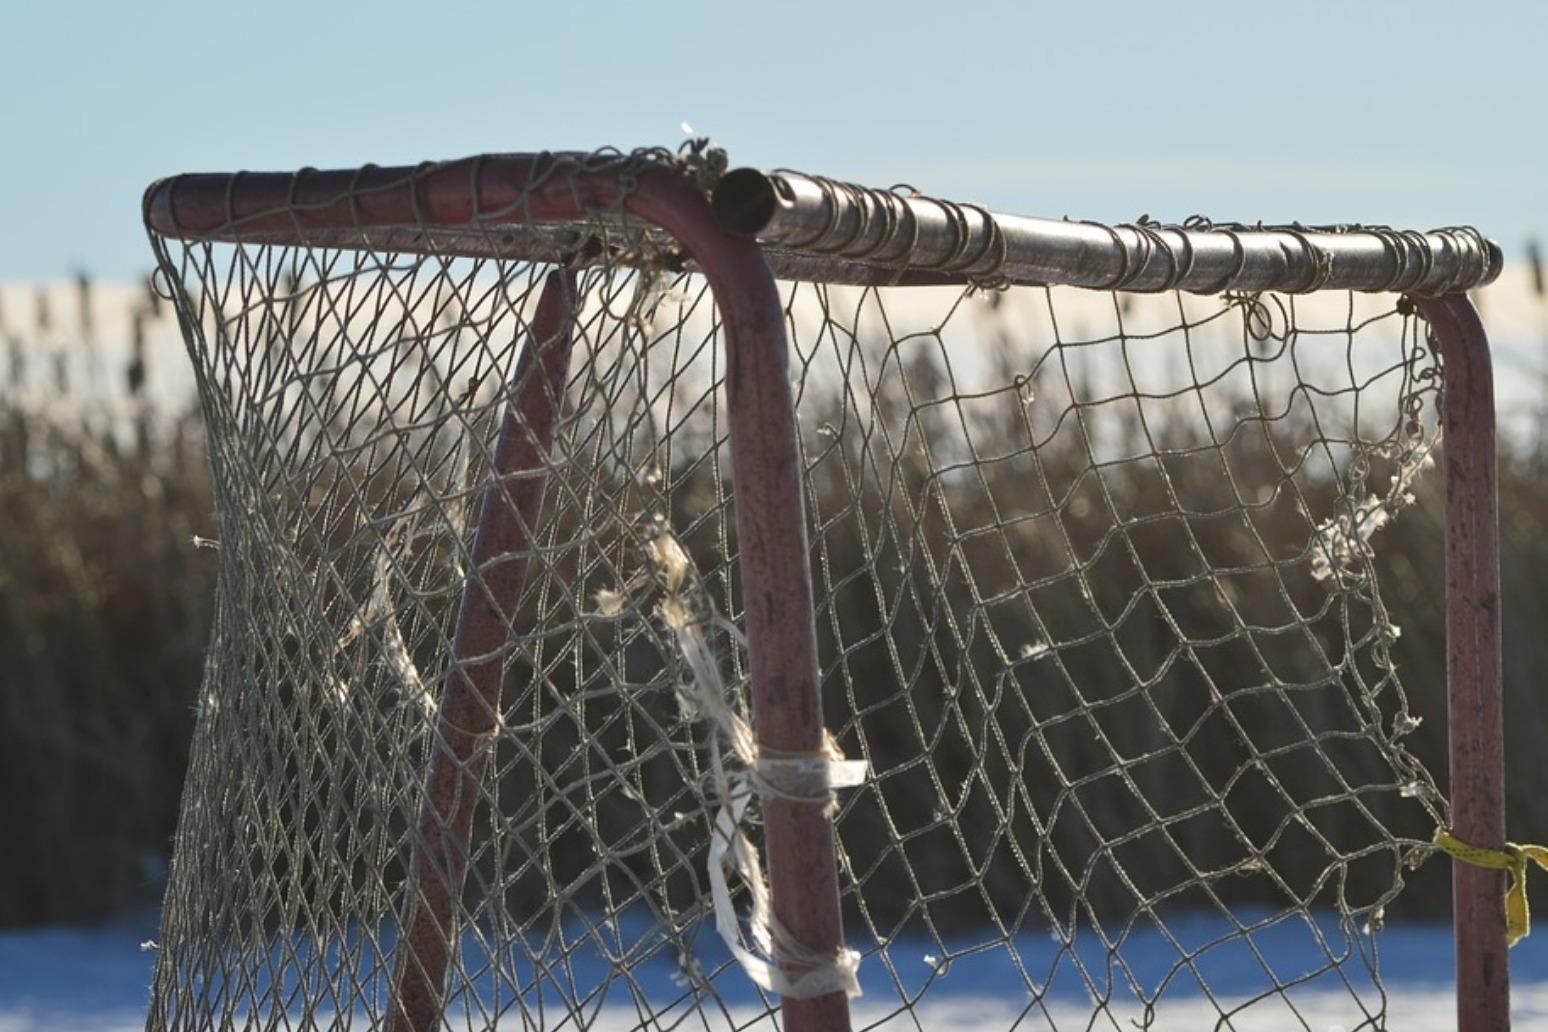 Fourteen killed in Canadian youth hockey team bus crash